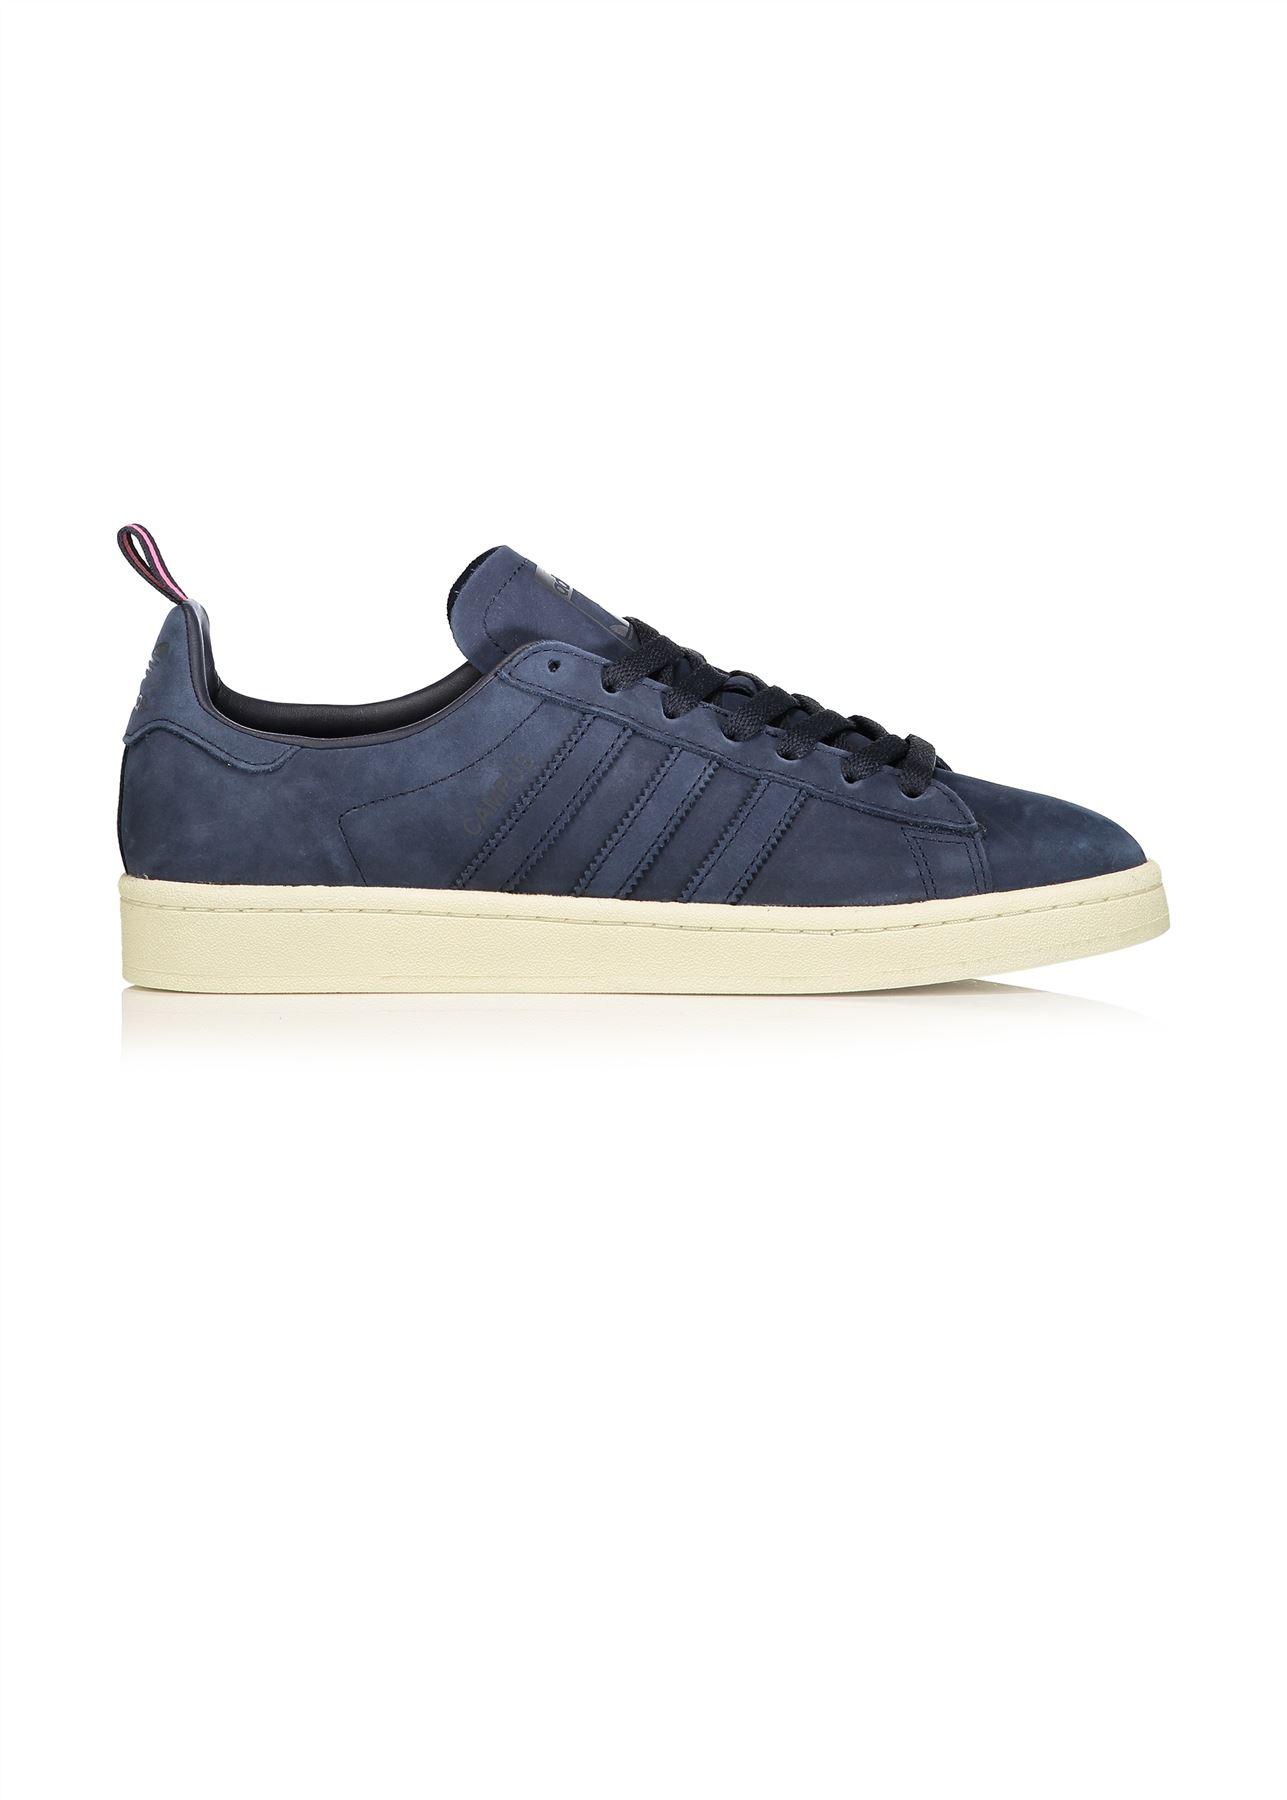 best cheap 9feee 60efc Adidas-Campus-Baskets-Homme-RRP-74-99-UK-